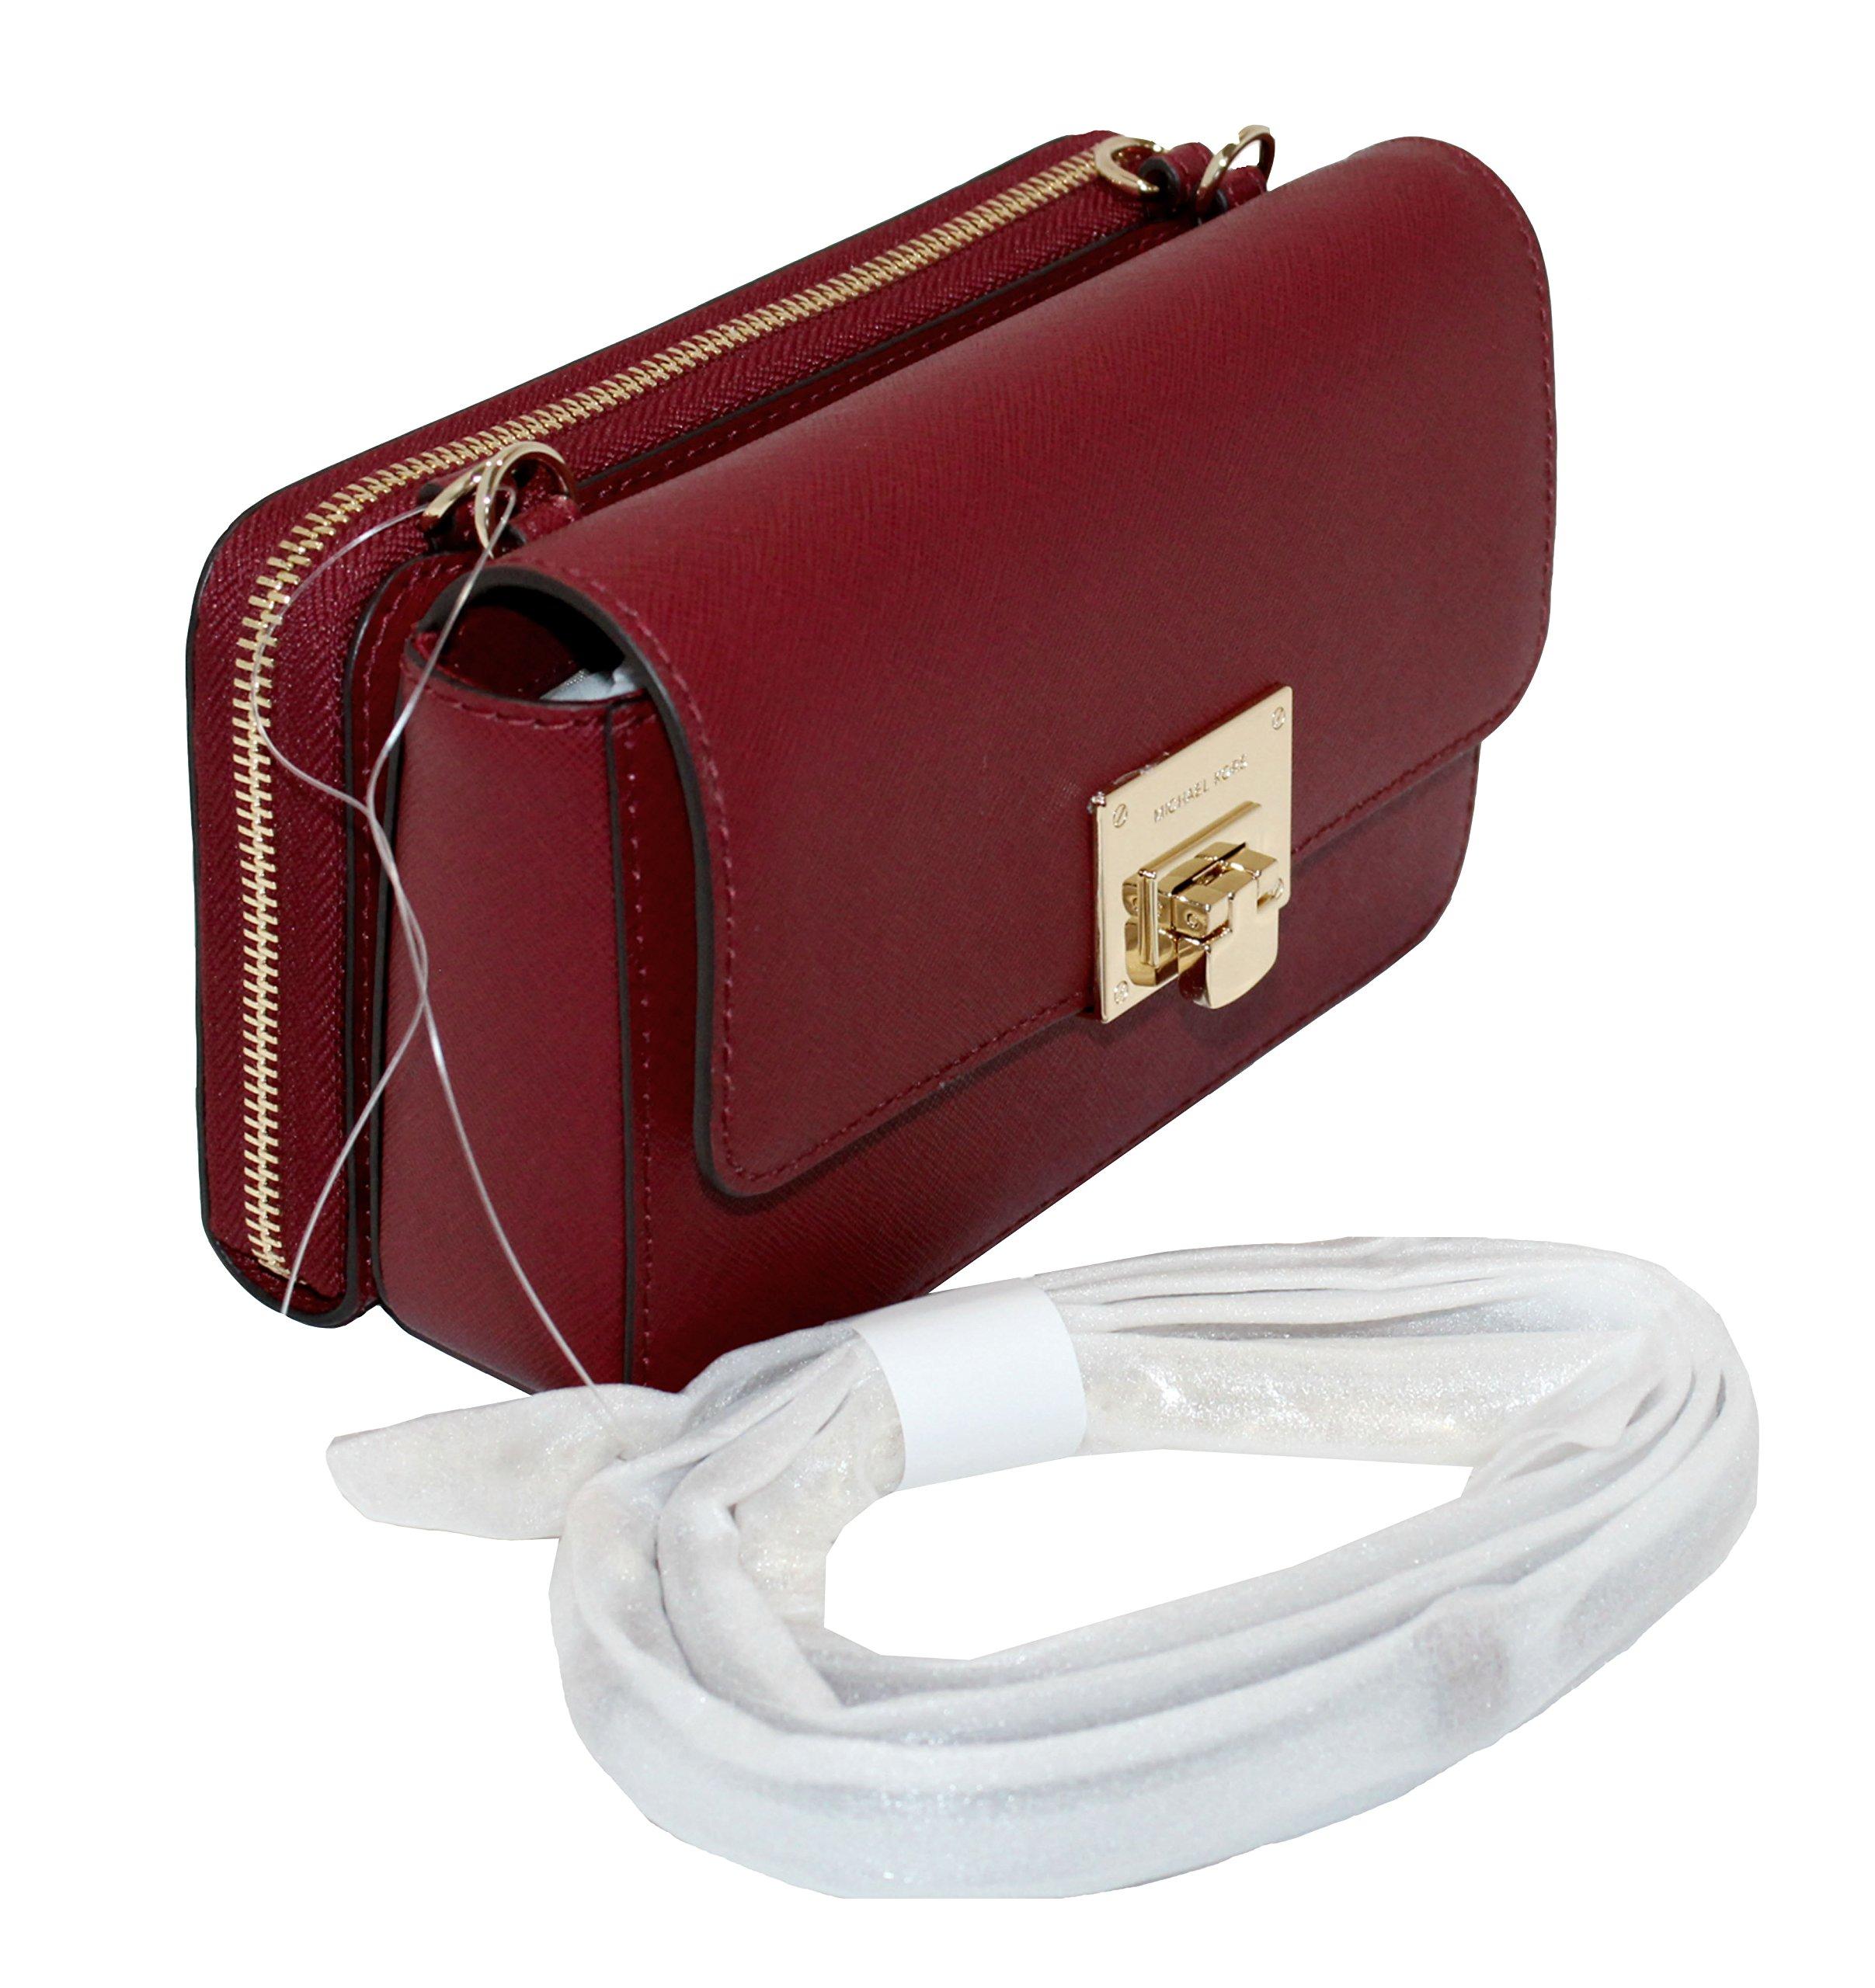 MICHAEL Michael Kors Tina Women's Wallet Clutch Xbody Shoulder Leather Double Bag (Cherry)